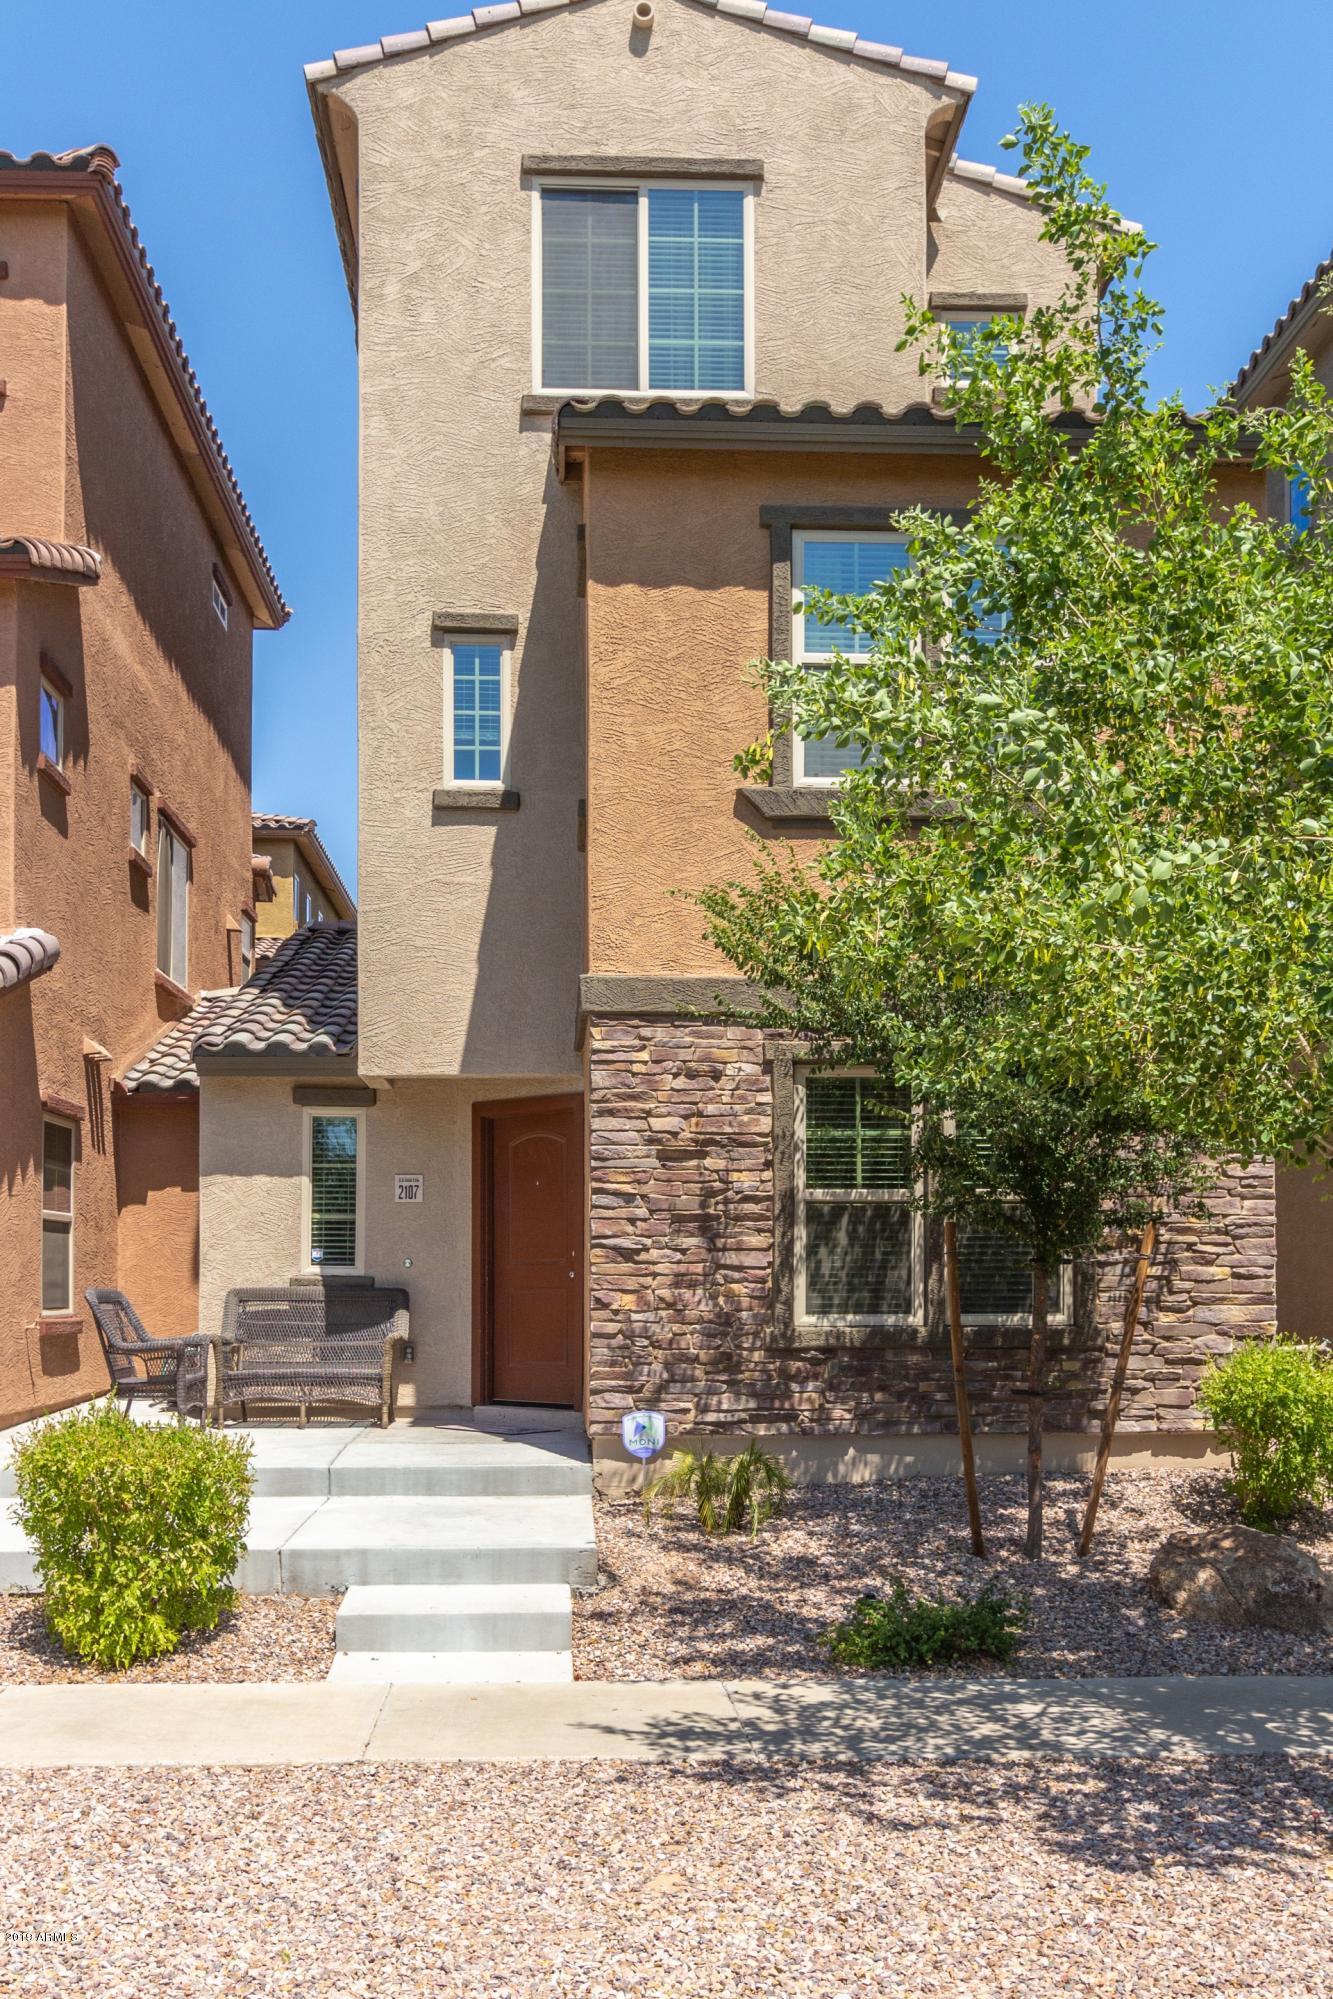 Photo for 2107 N 77th Glen, Phoenix, AZ 85035 (MLS # 5953685)